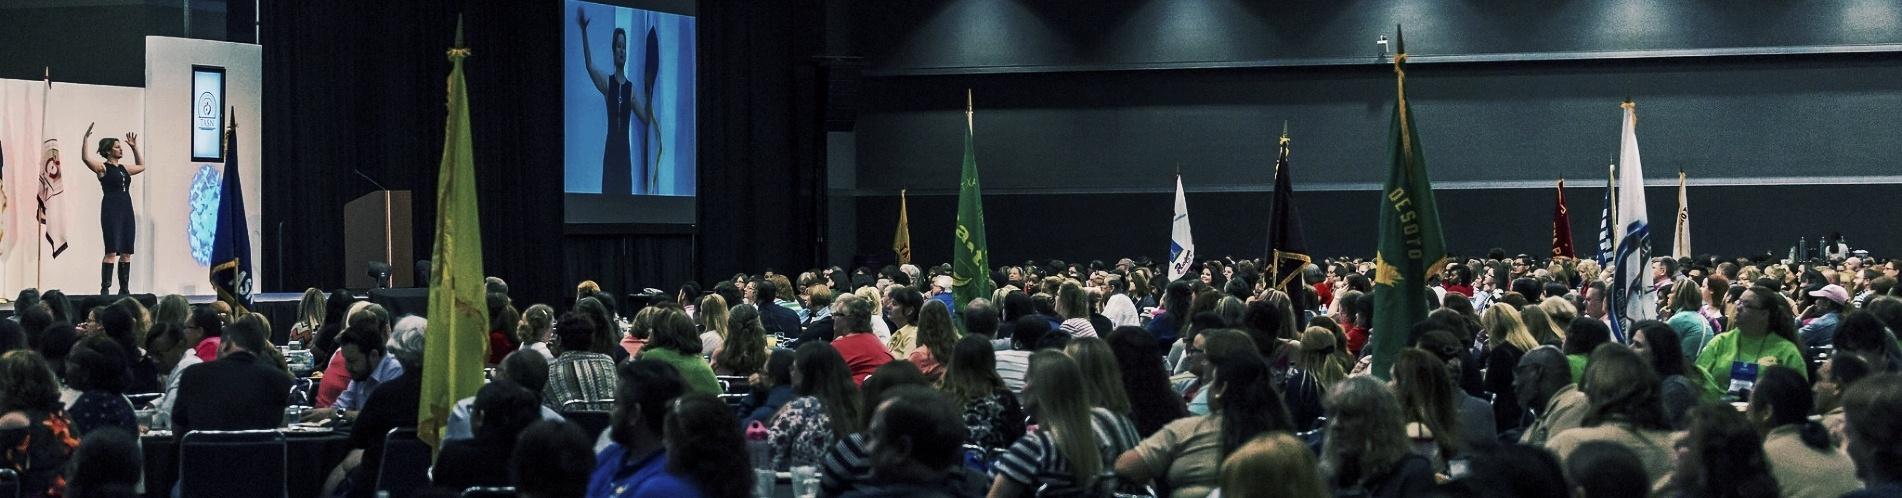 Female Motivational Speakers